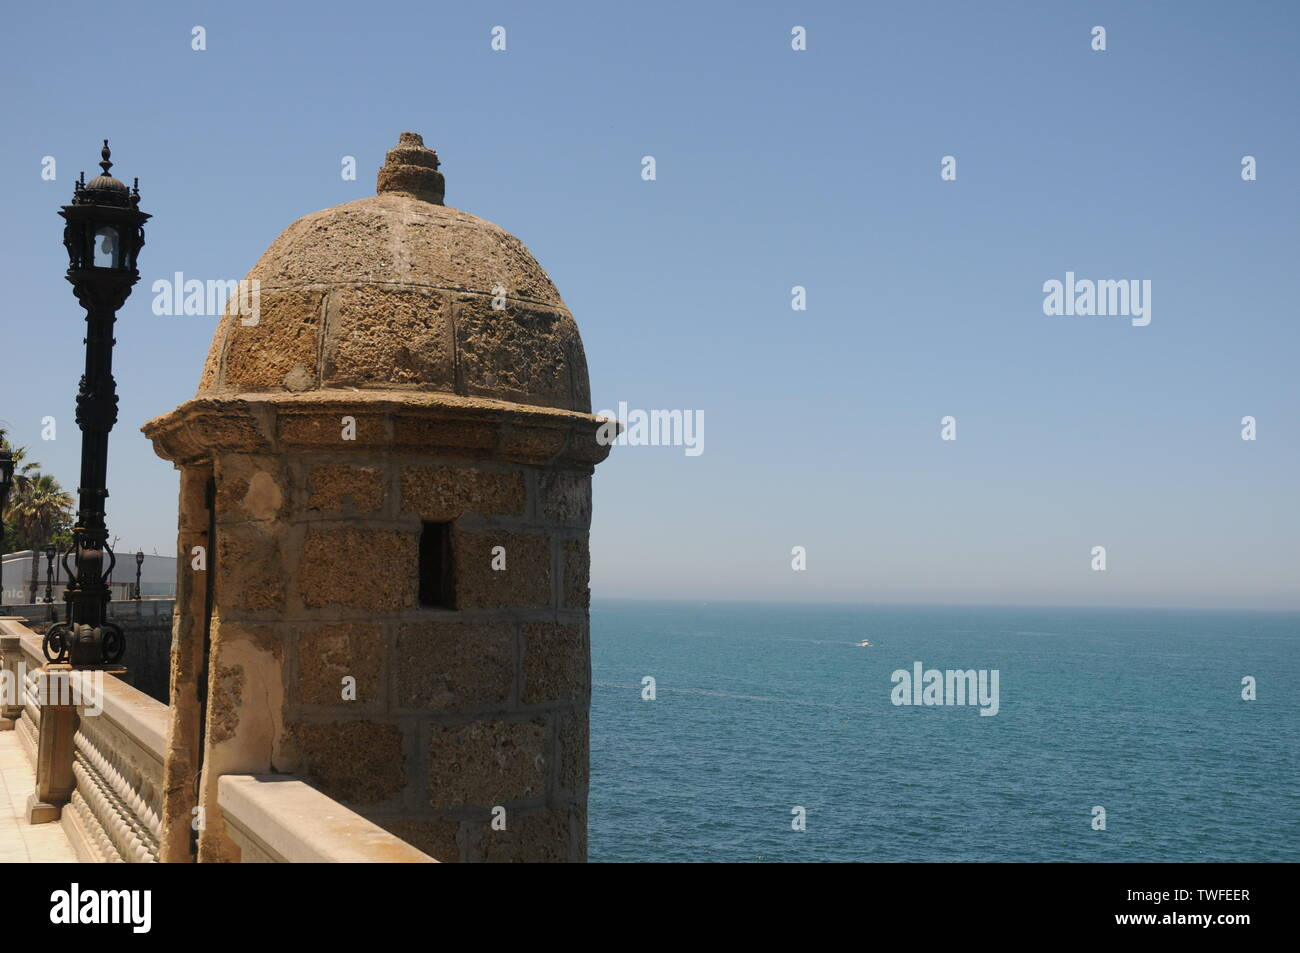 Old Watchtower,  scarabs  in Alameda Apodaca, Cadiz Bay - Stock Image